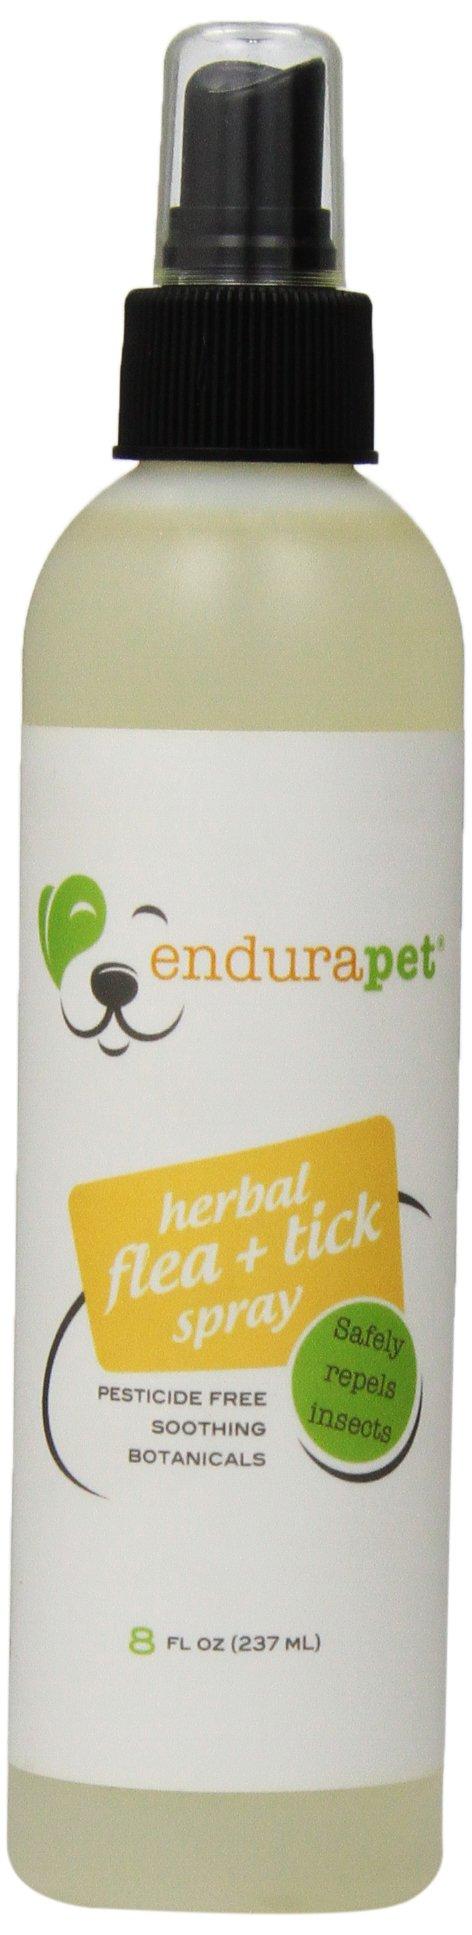 EnduraPet Herbal Flea and Tick Spray for Pets